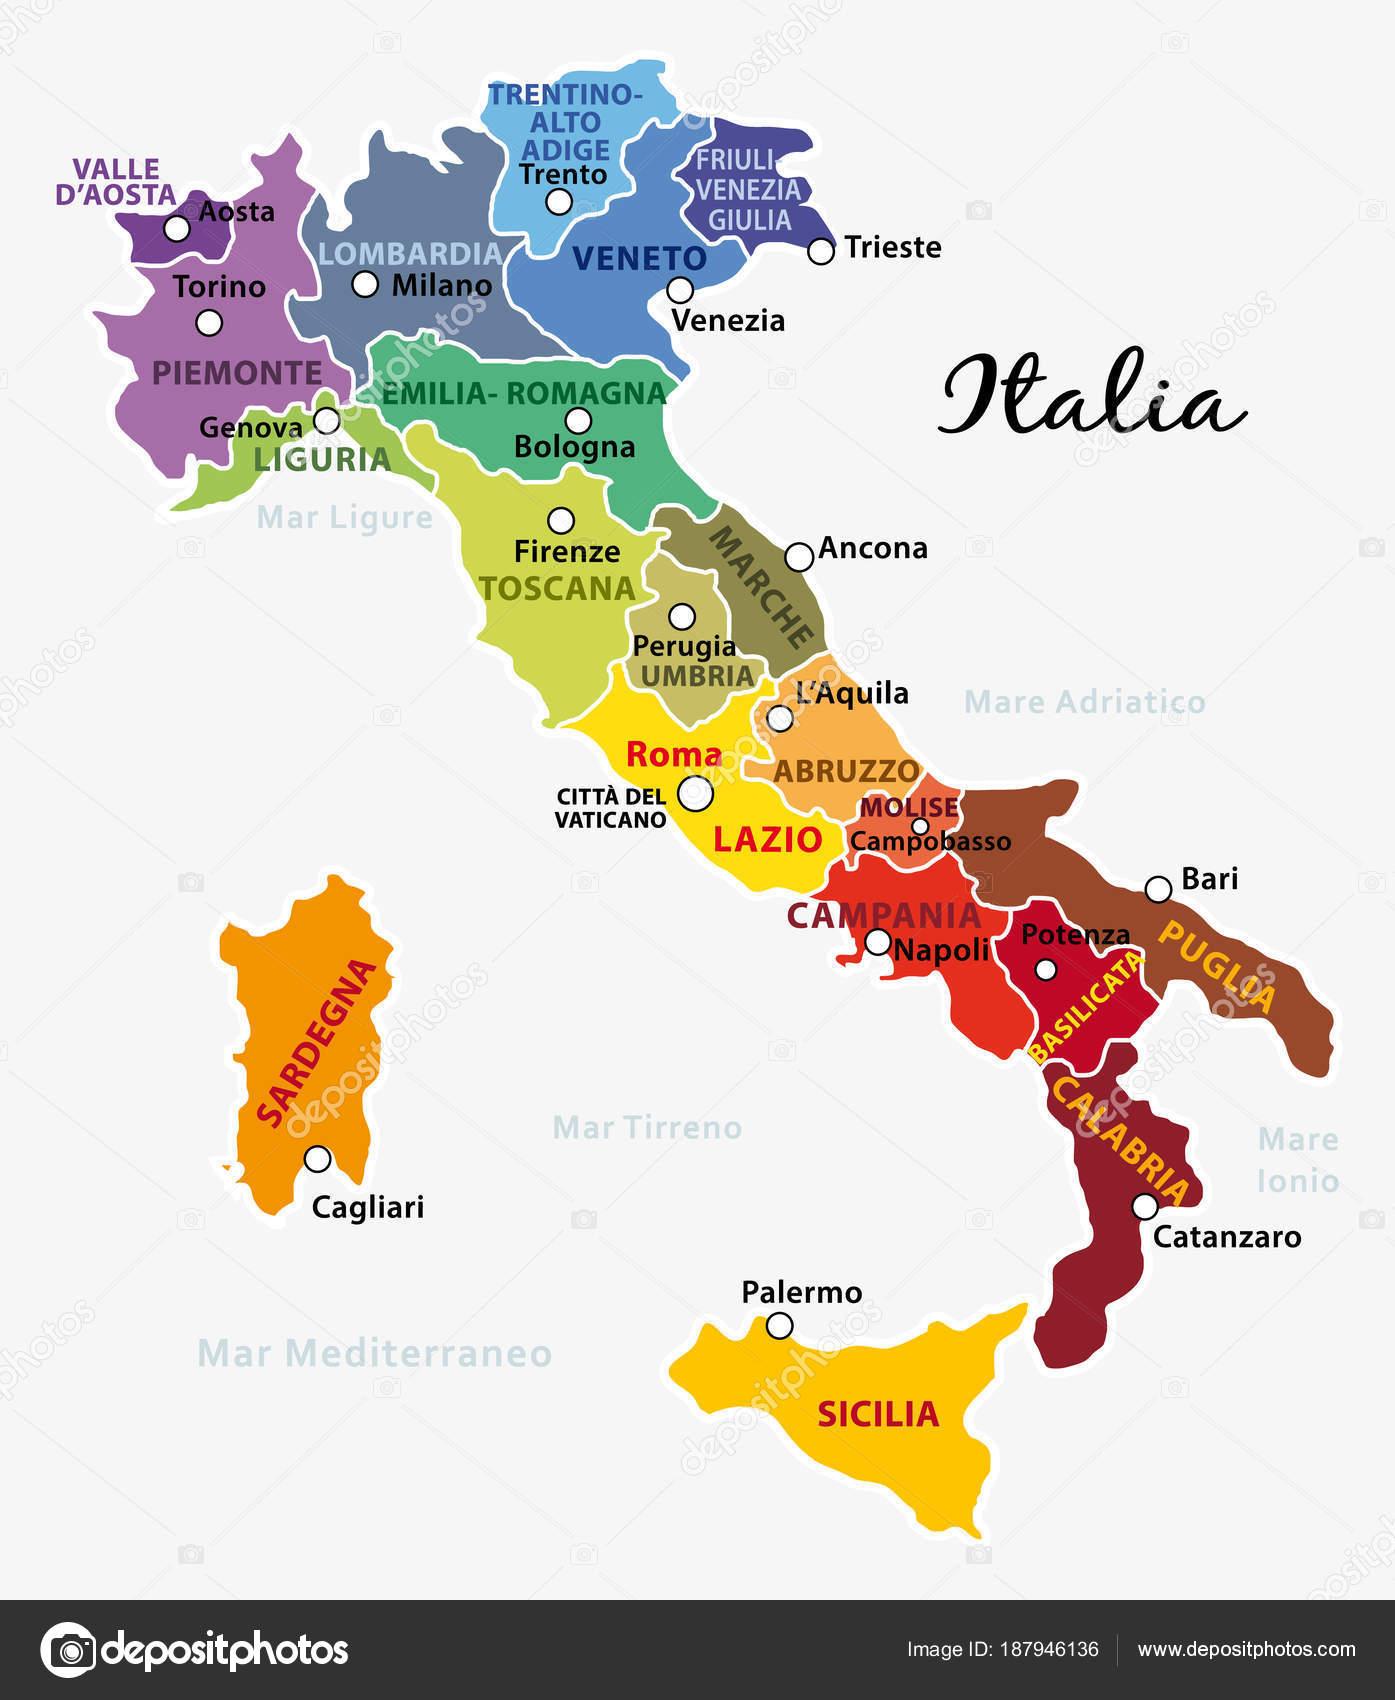 Beautiful Colorful Map Italy Italian Regions Capitals Important ...